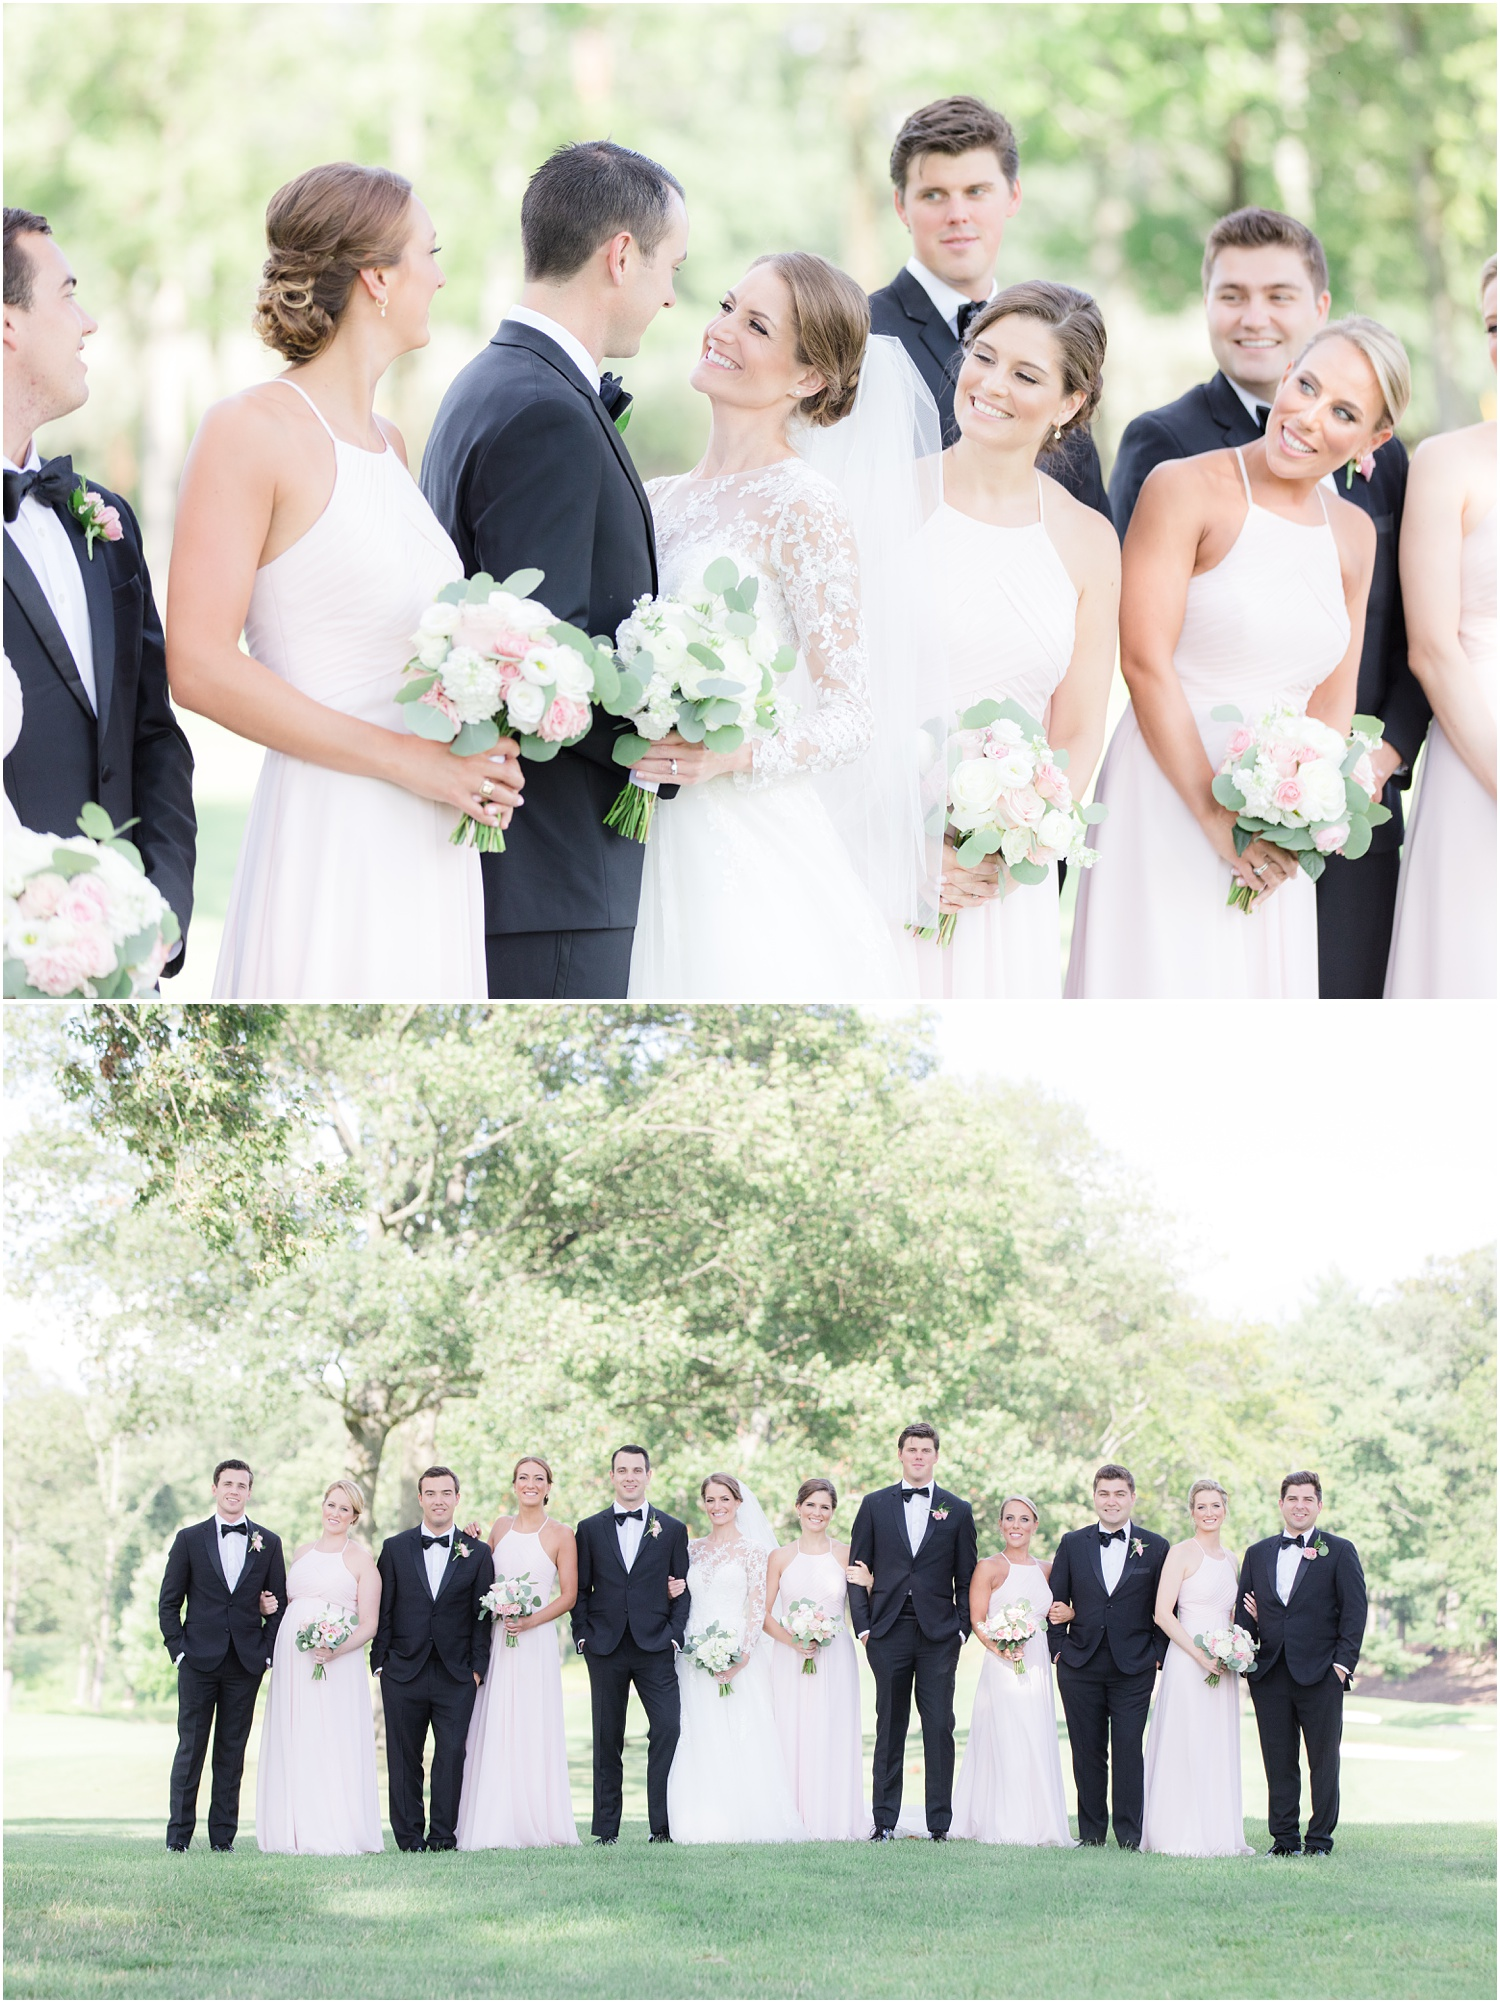 Bridal party photos at Canoe Brook Country Club